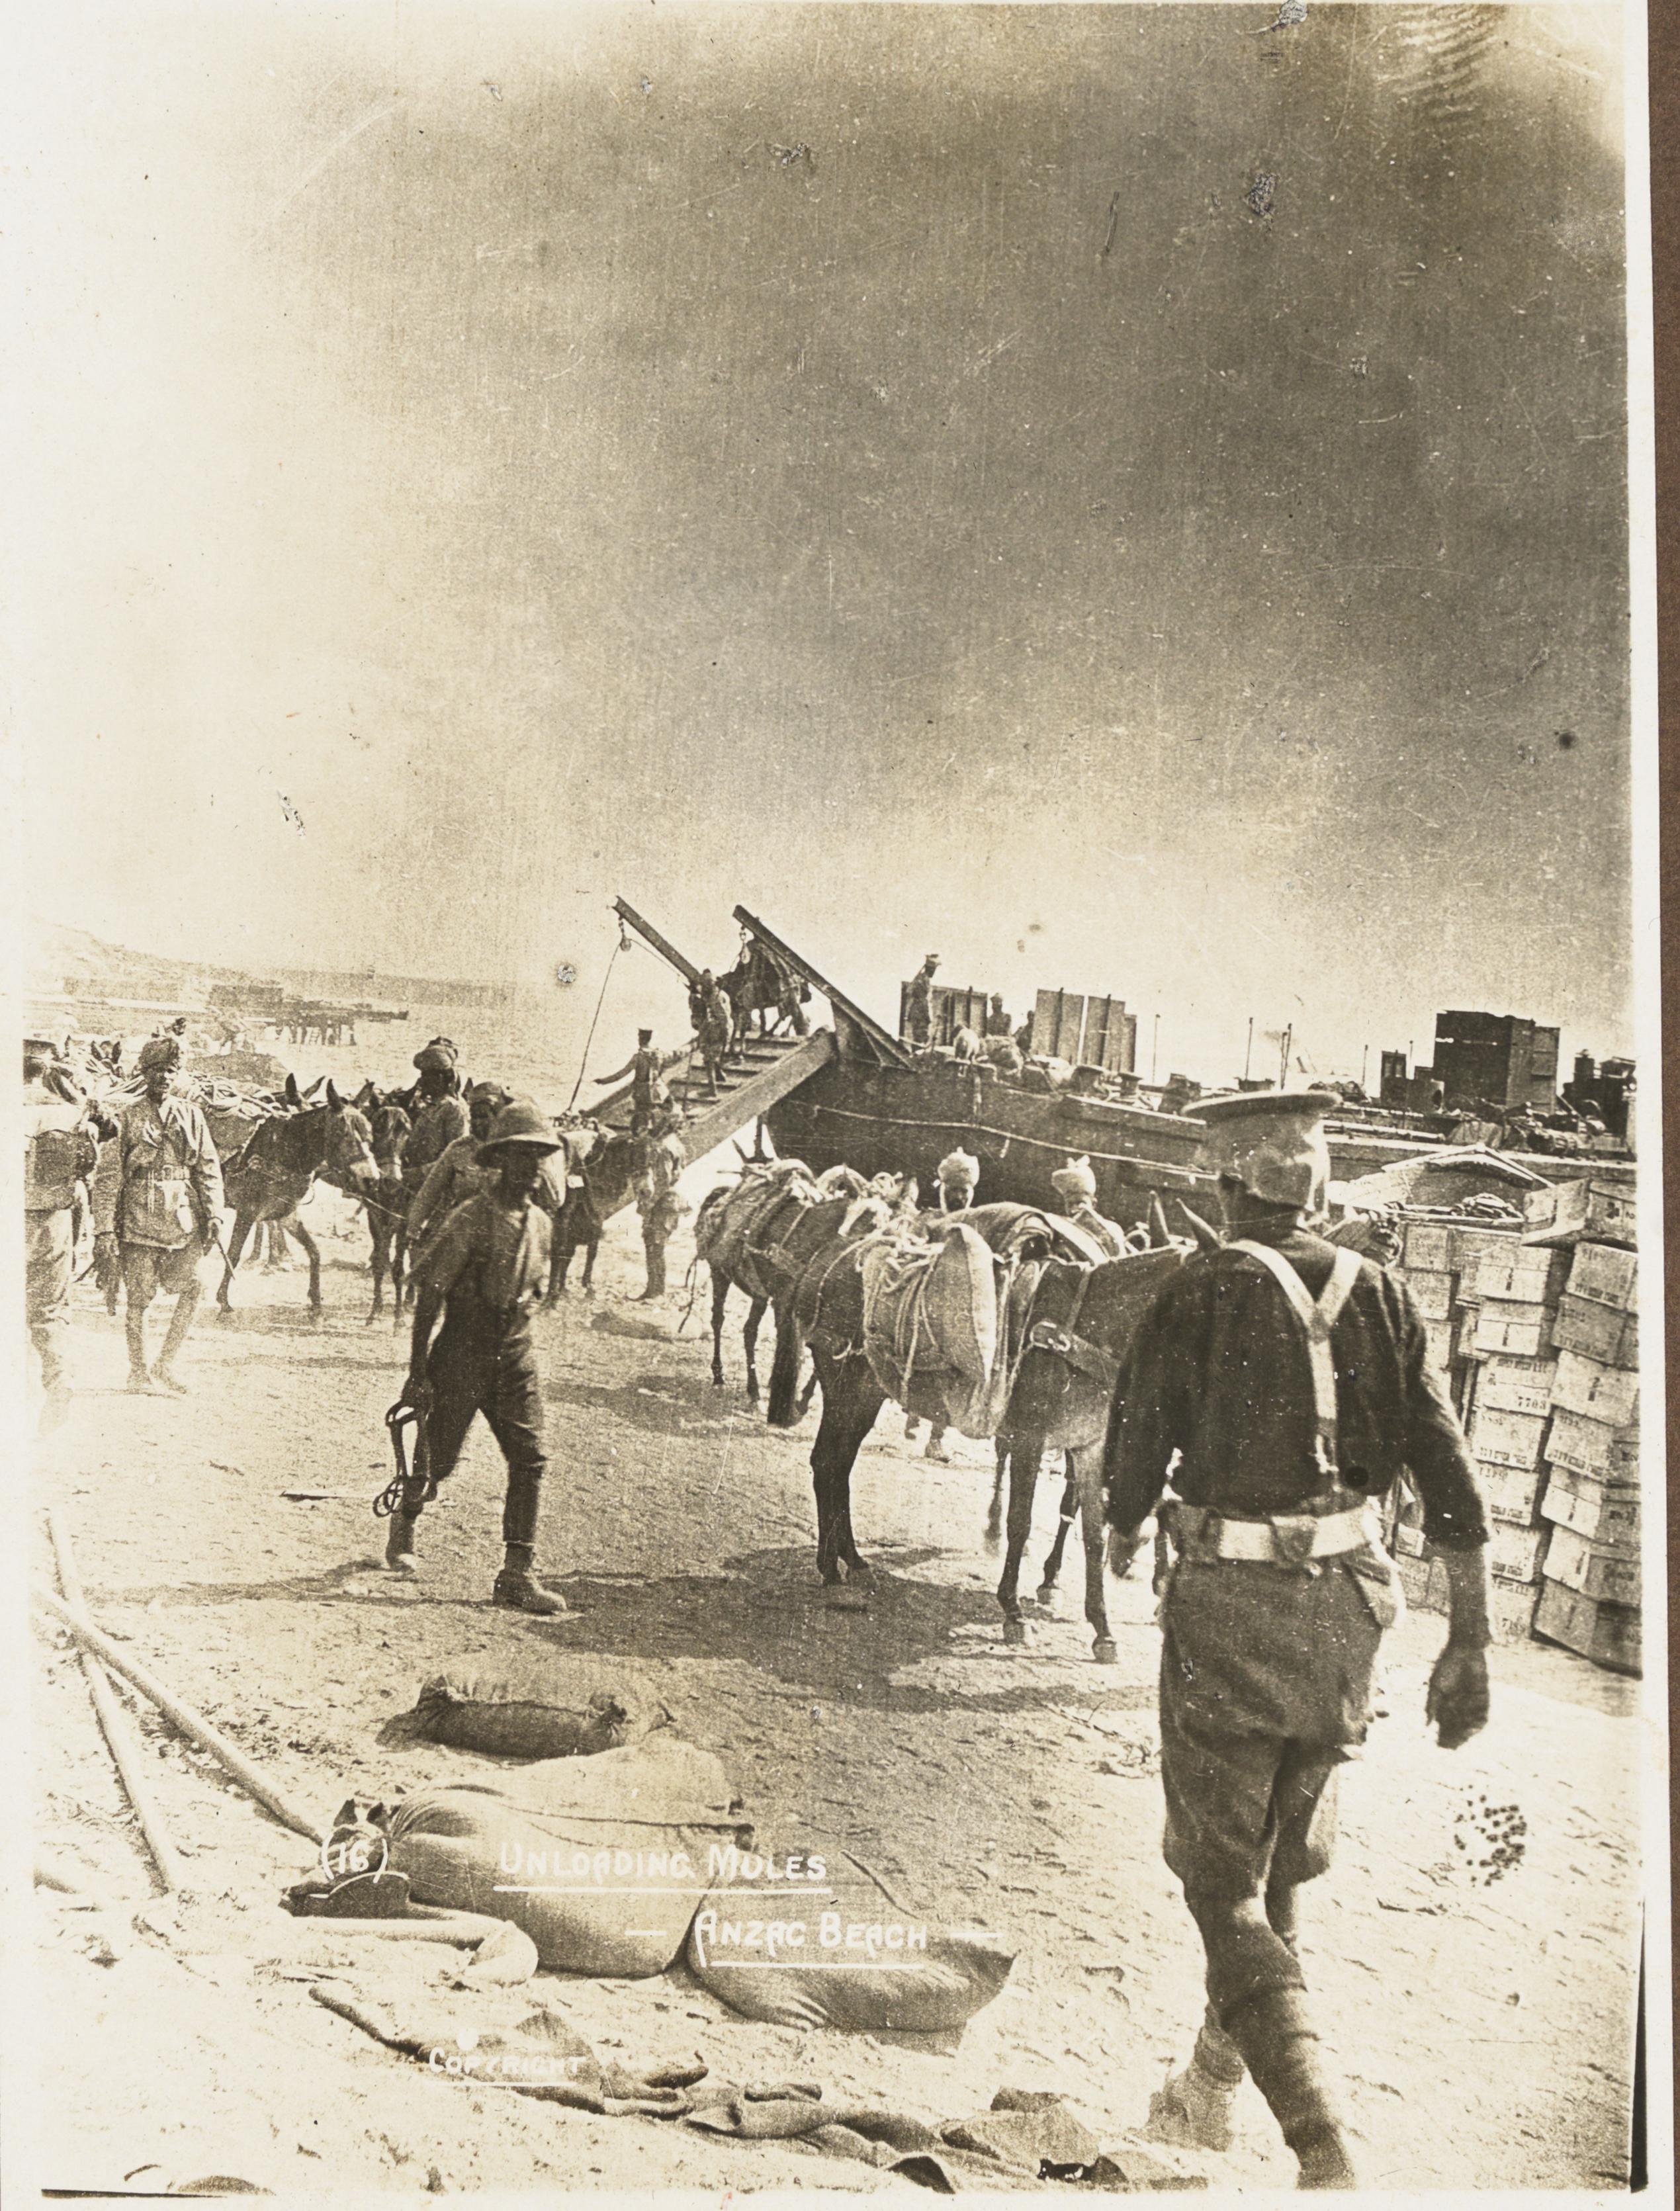 Unloading mules, ANZAC Beach, 1915